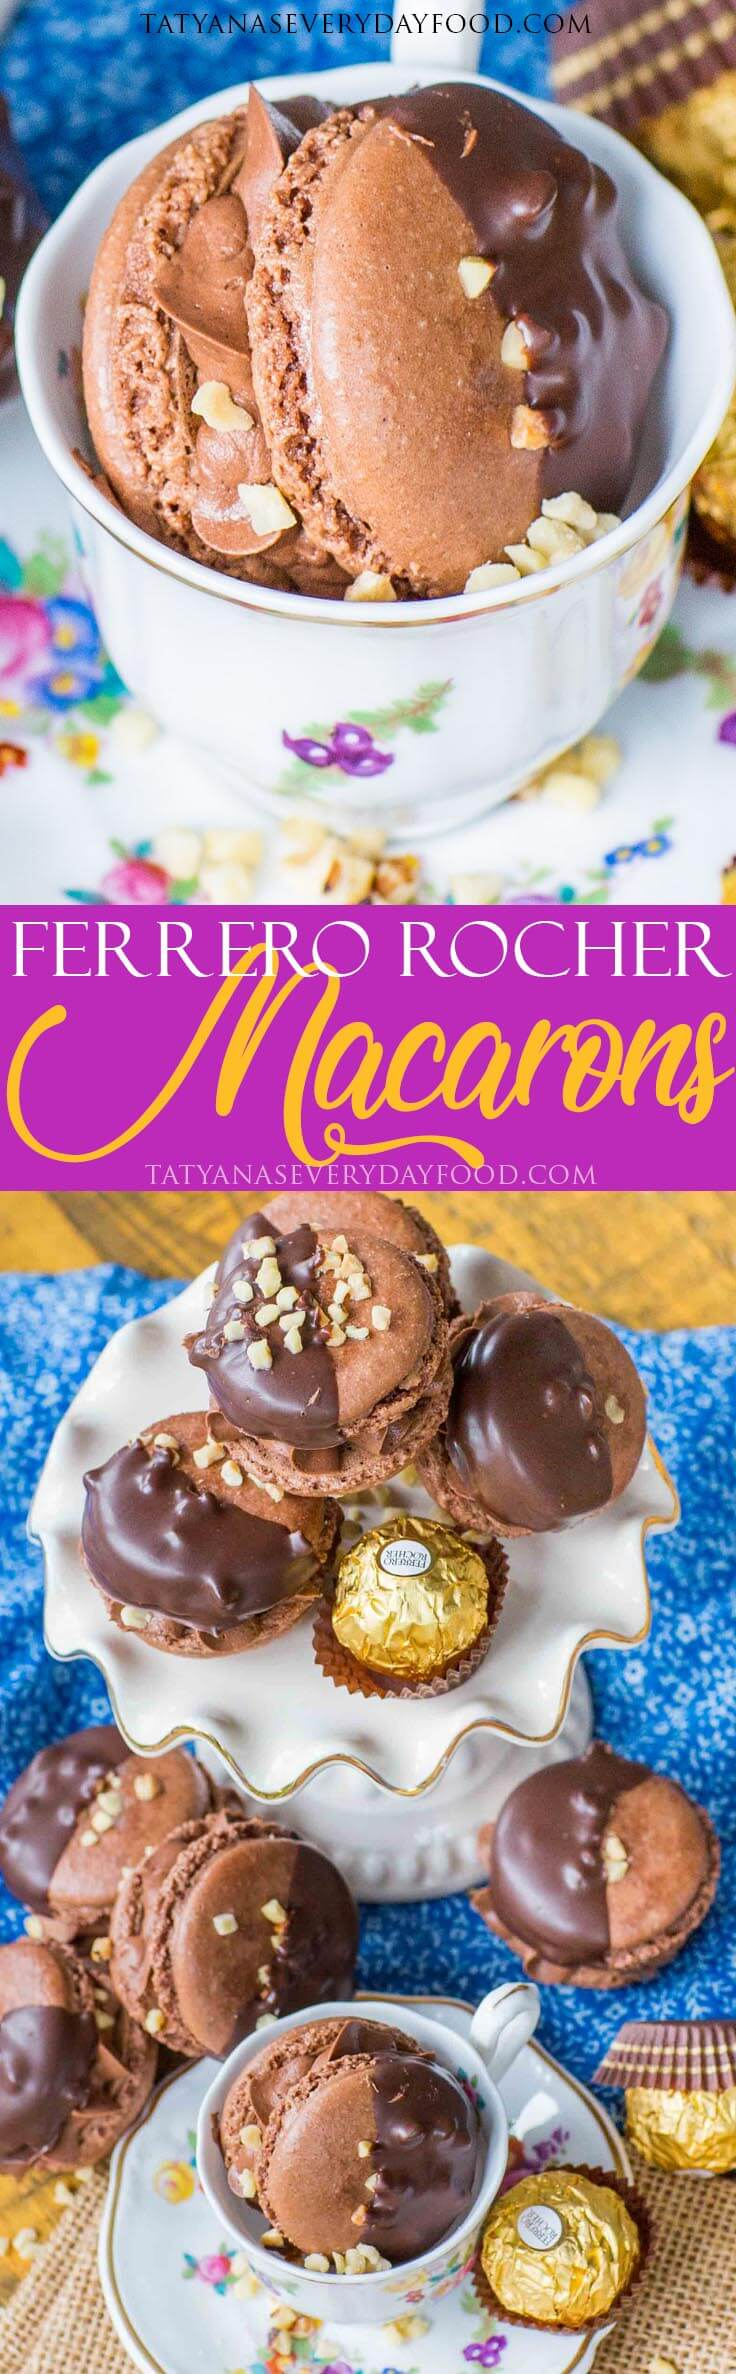 Chocolate Ferrero Rocher French Macarons with video recipe